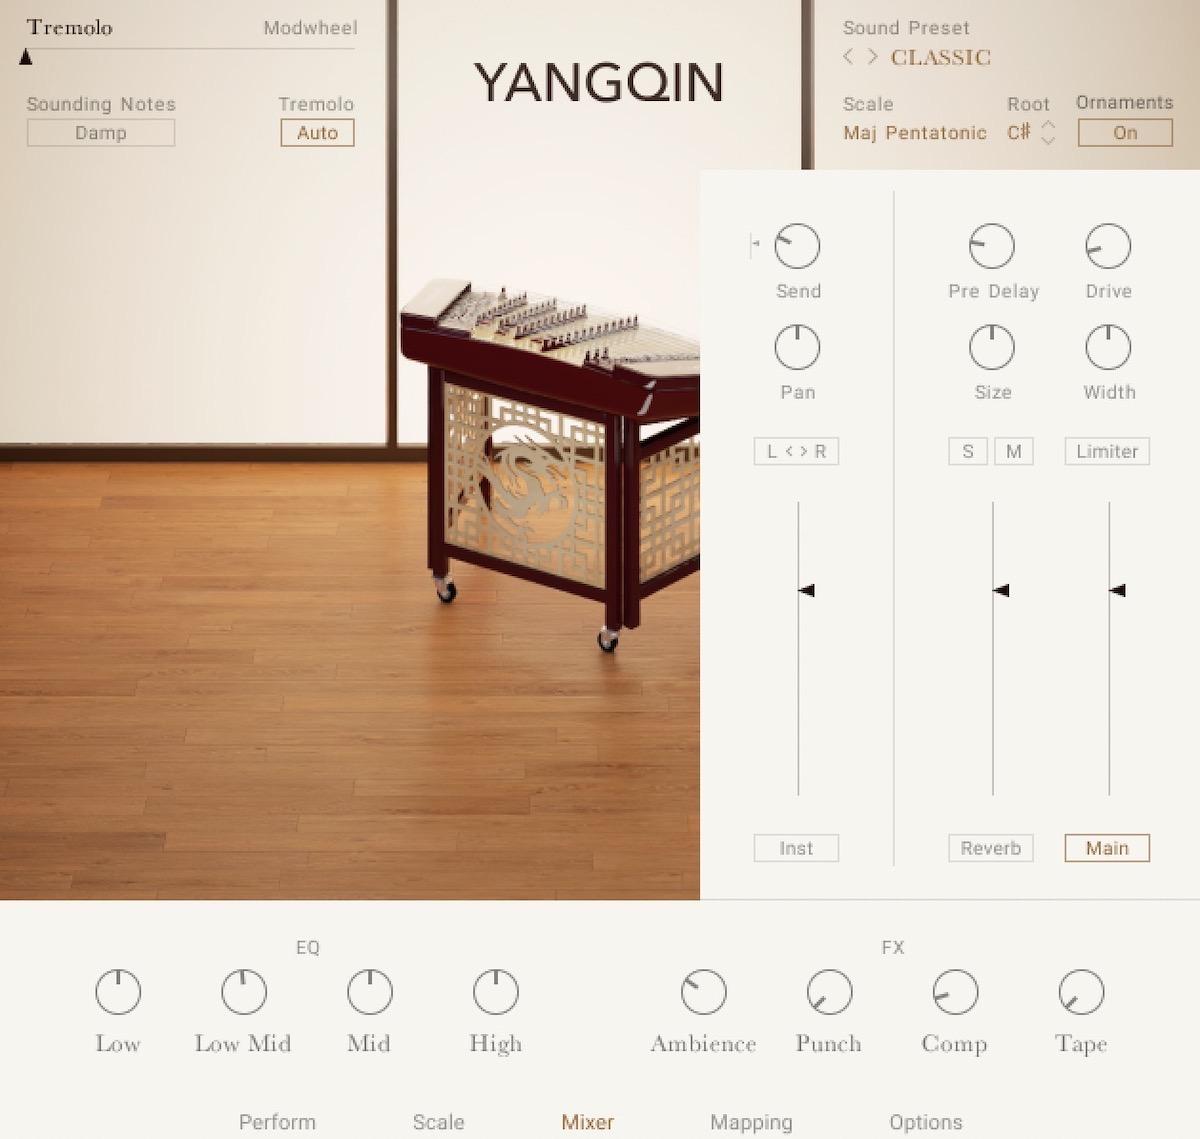 Yangqin5